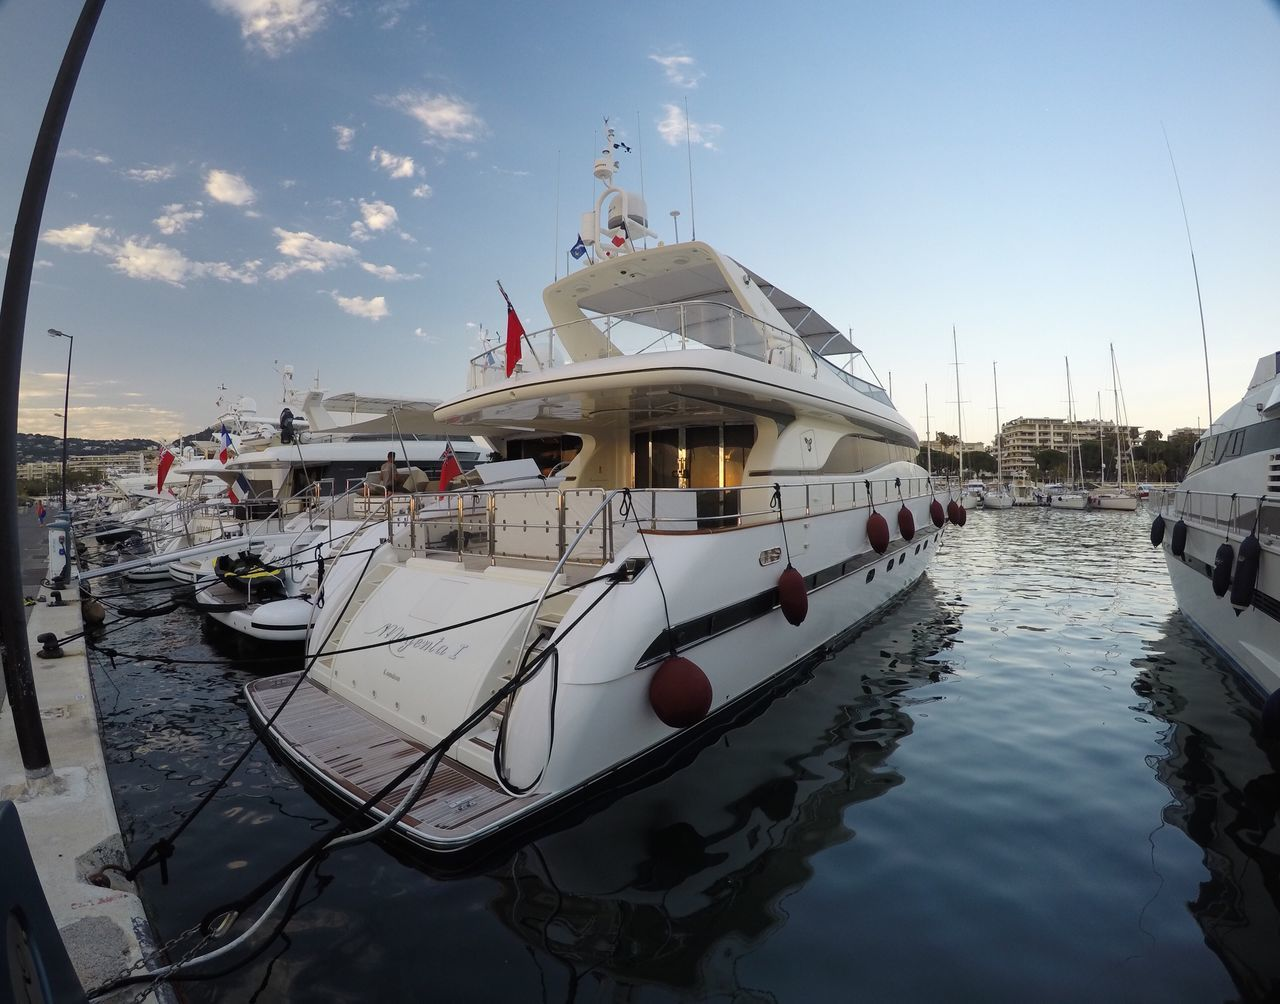 Hello World Taking Photos Yacht Cannes Luxury Port Canto France 🇫🇷 Sea Sun Fun